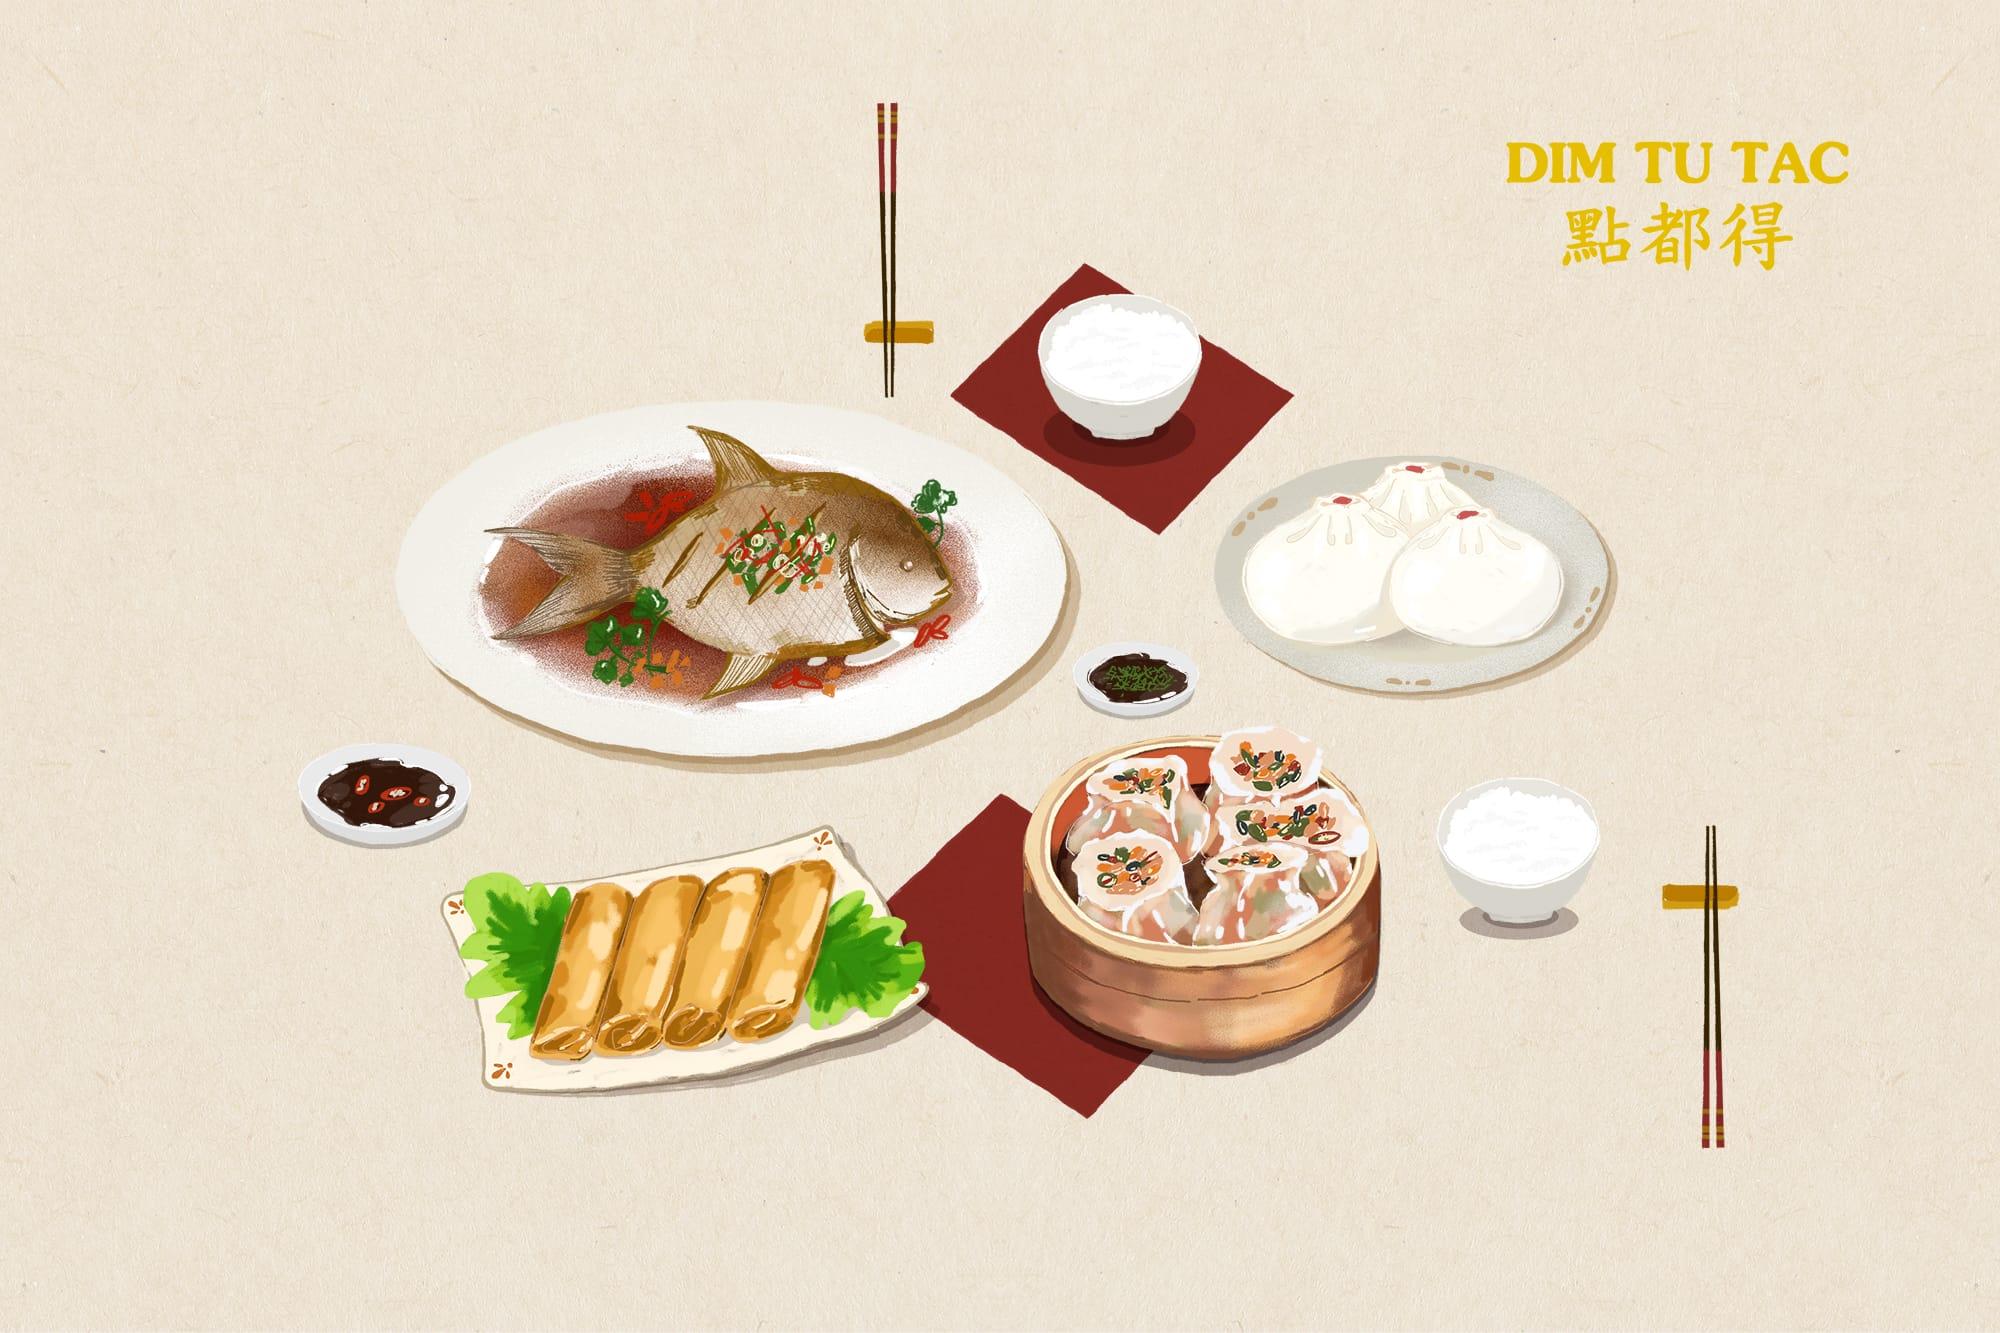 Dim Tu Tac Dishes Featured Image 1